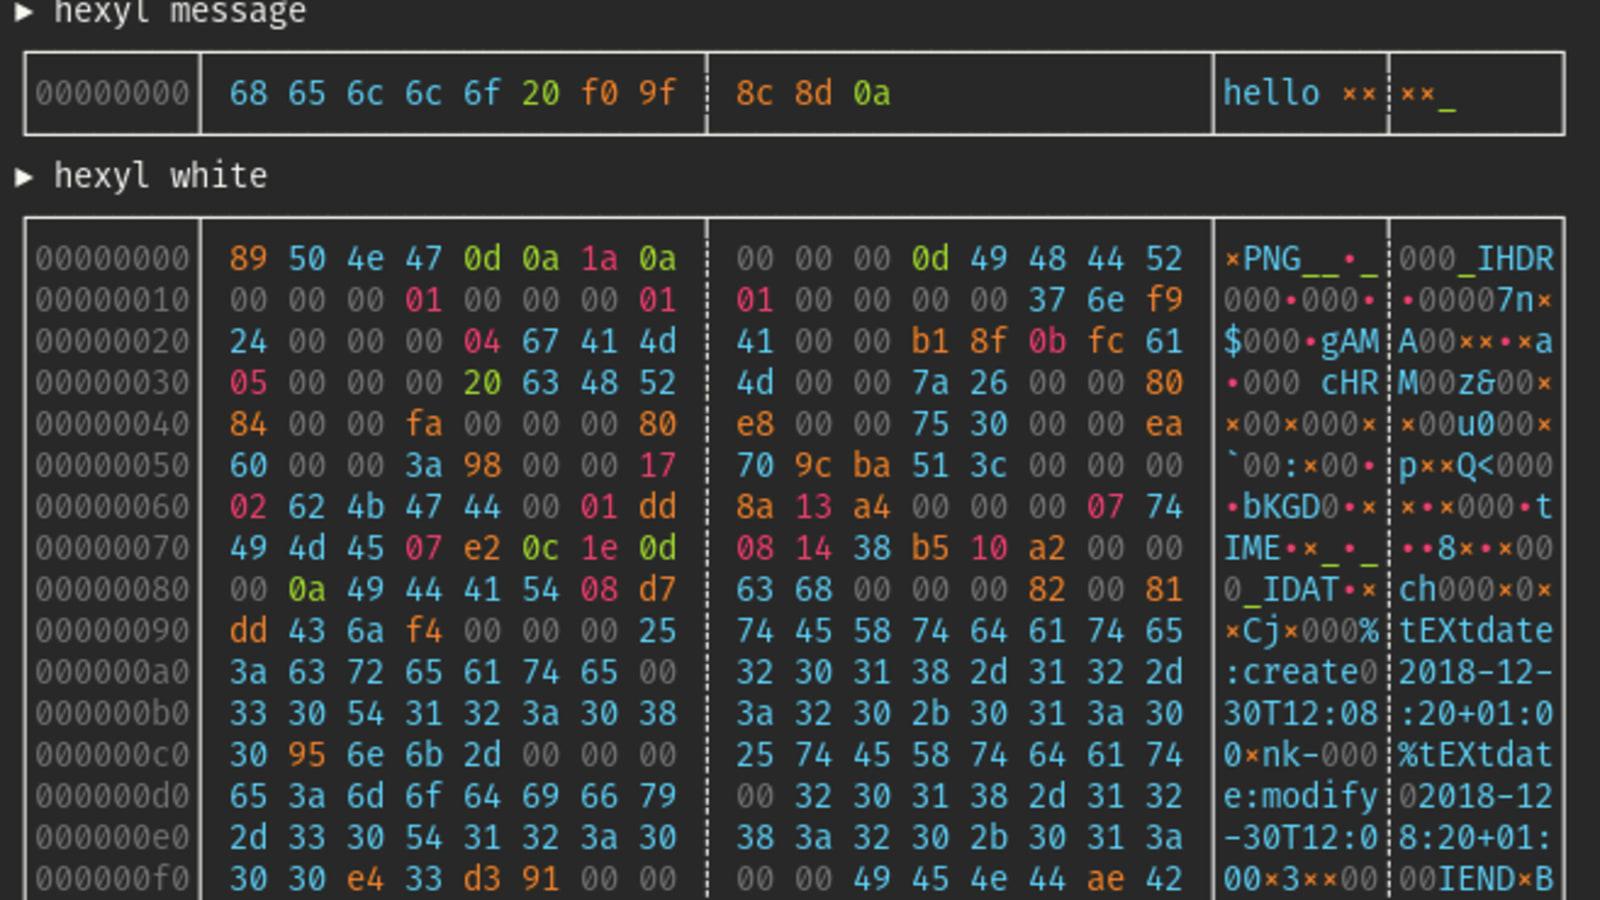 Pengertian & Perbedaan antara bit (b) dengan Byte (B)